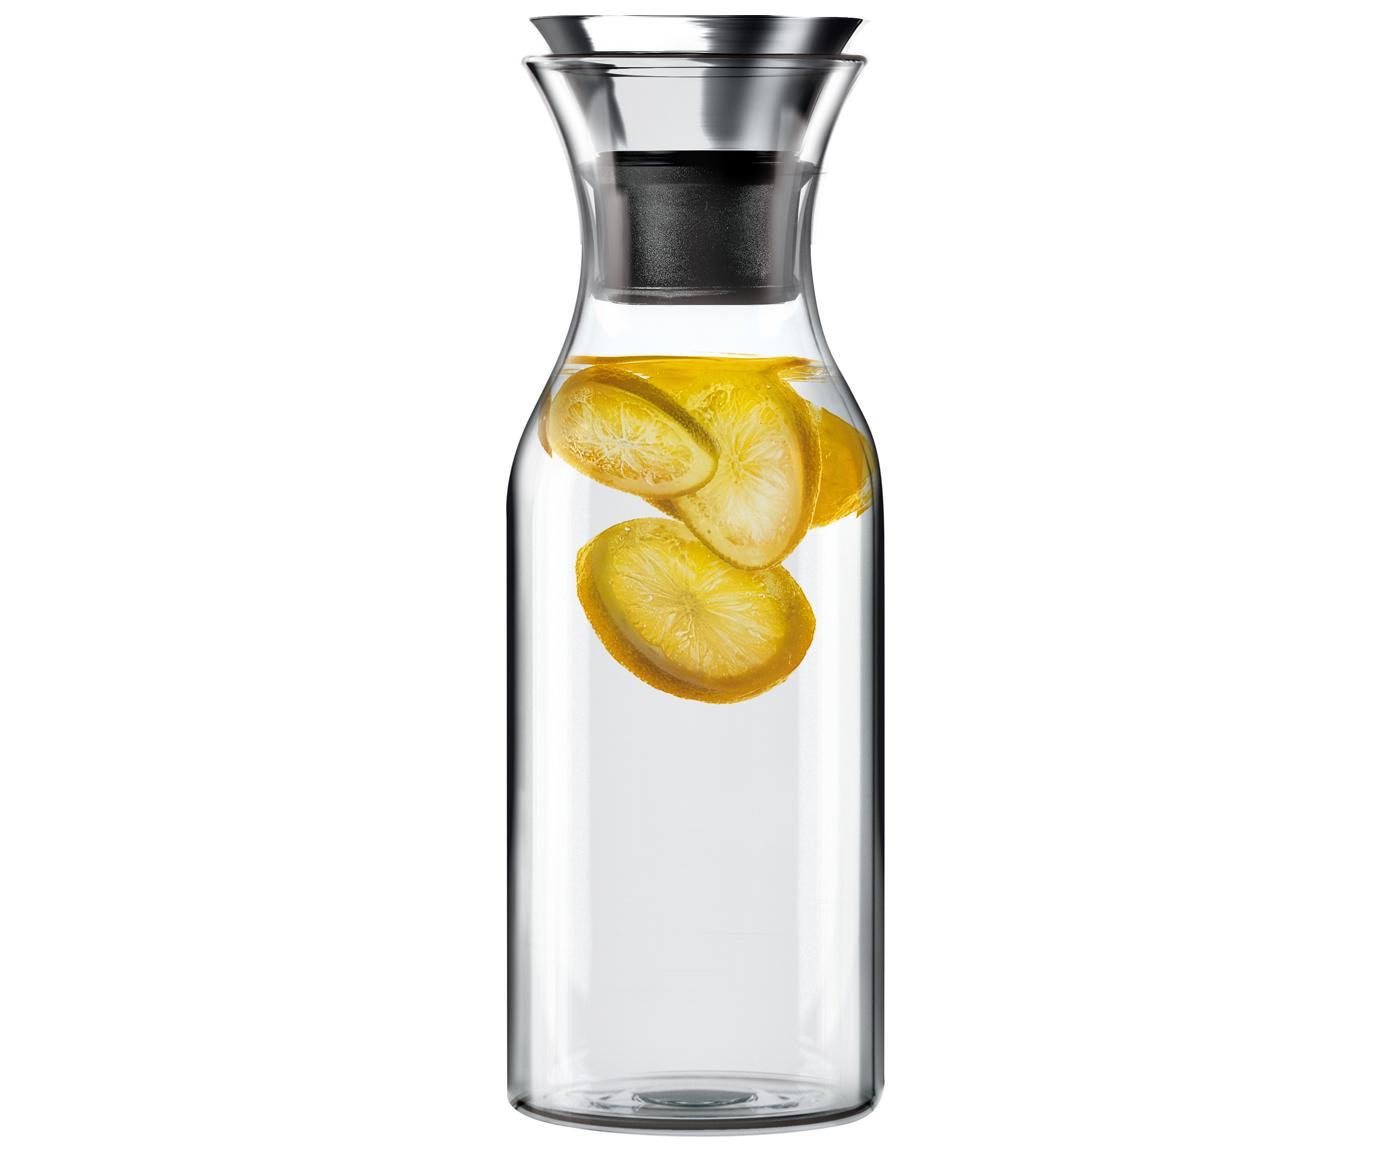 Jarra Eva Solo, Transparente, acero inoxidable, 1 L